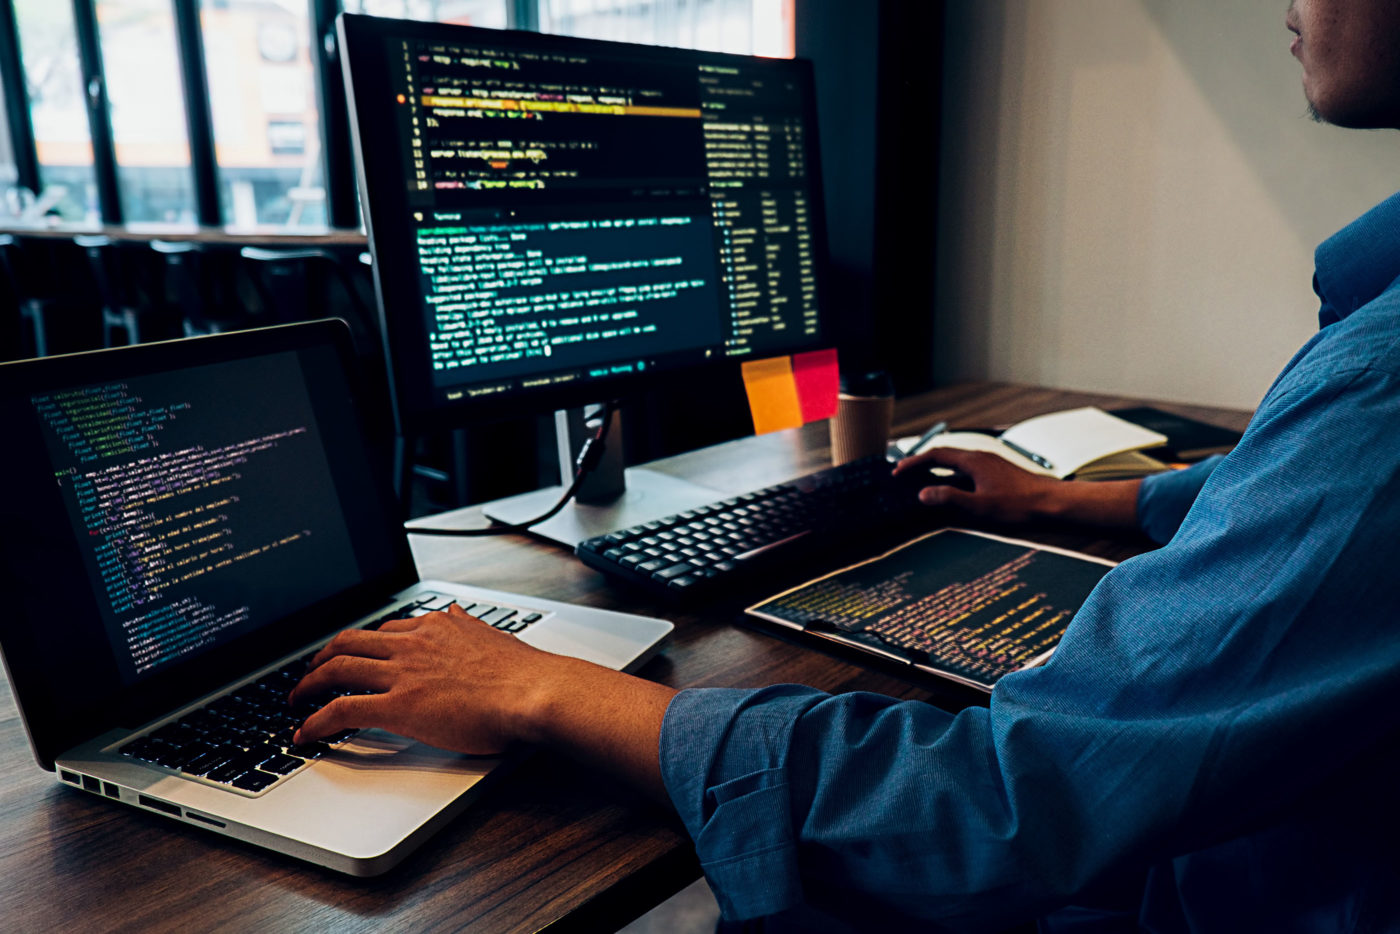 web designer looking at a screen